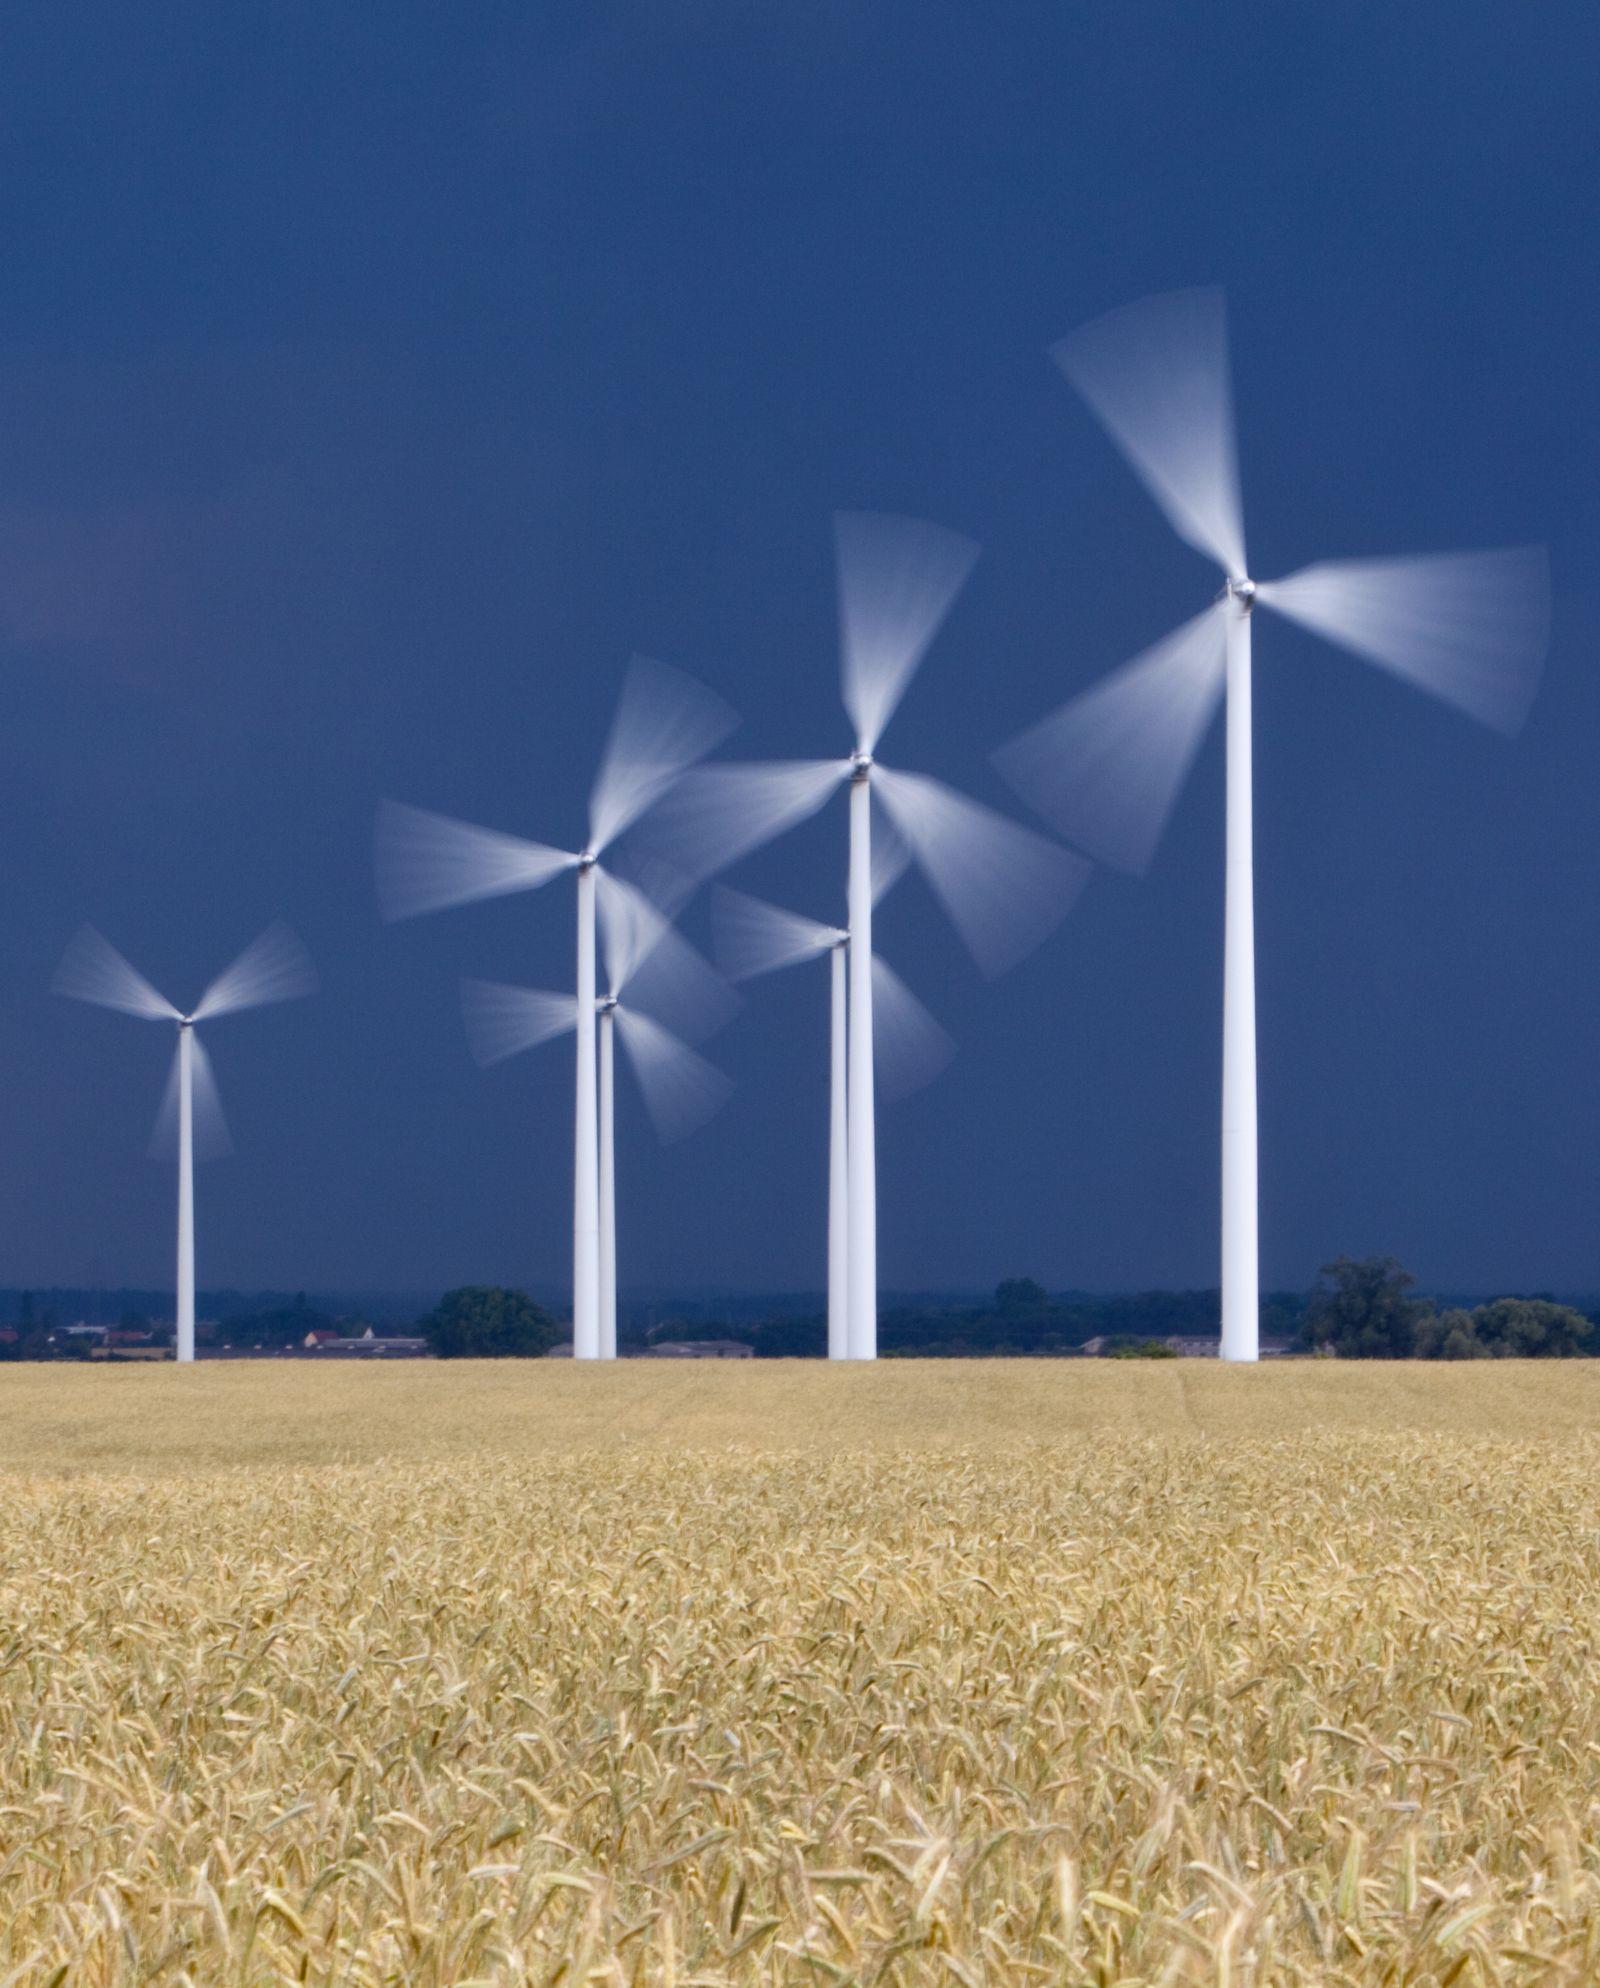 Themenseite Energiewende mmo